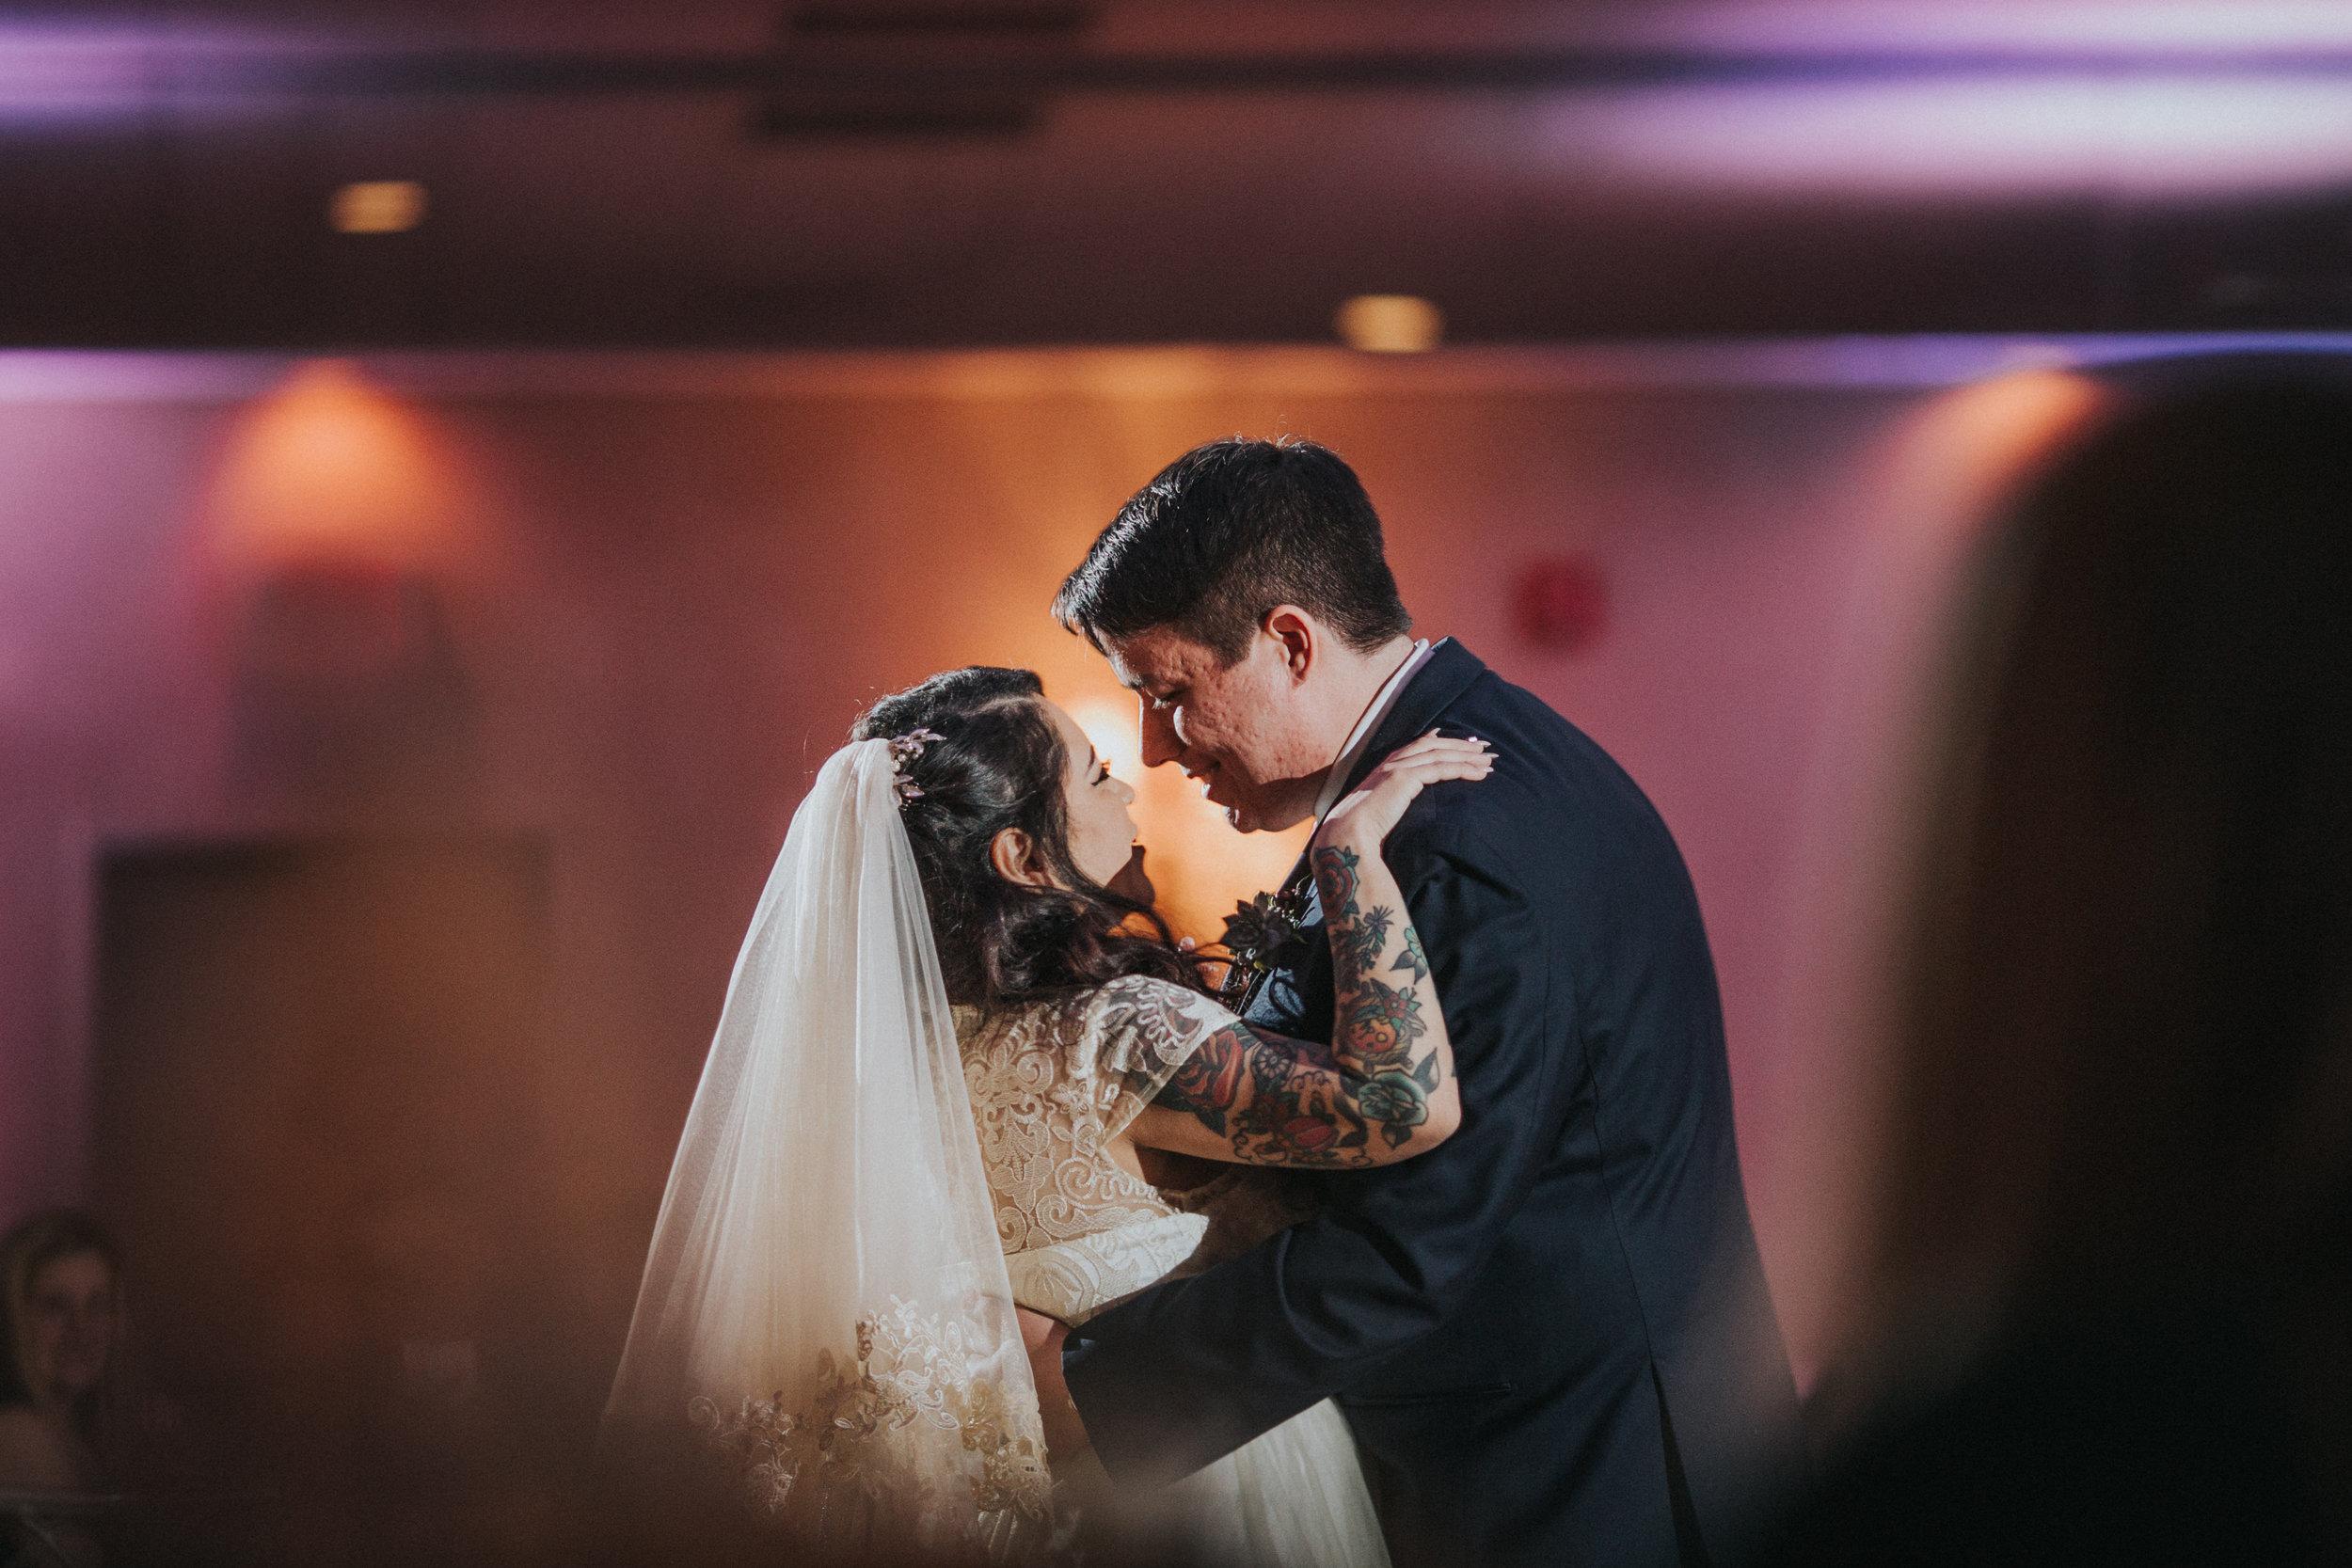 New-Jersey-Wedding-Photographer-ReceptionCenter-Valeria&Mike-Reception (12 of 265).jpg